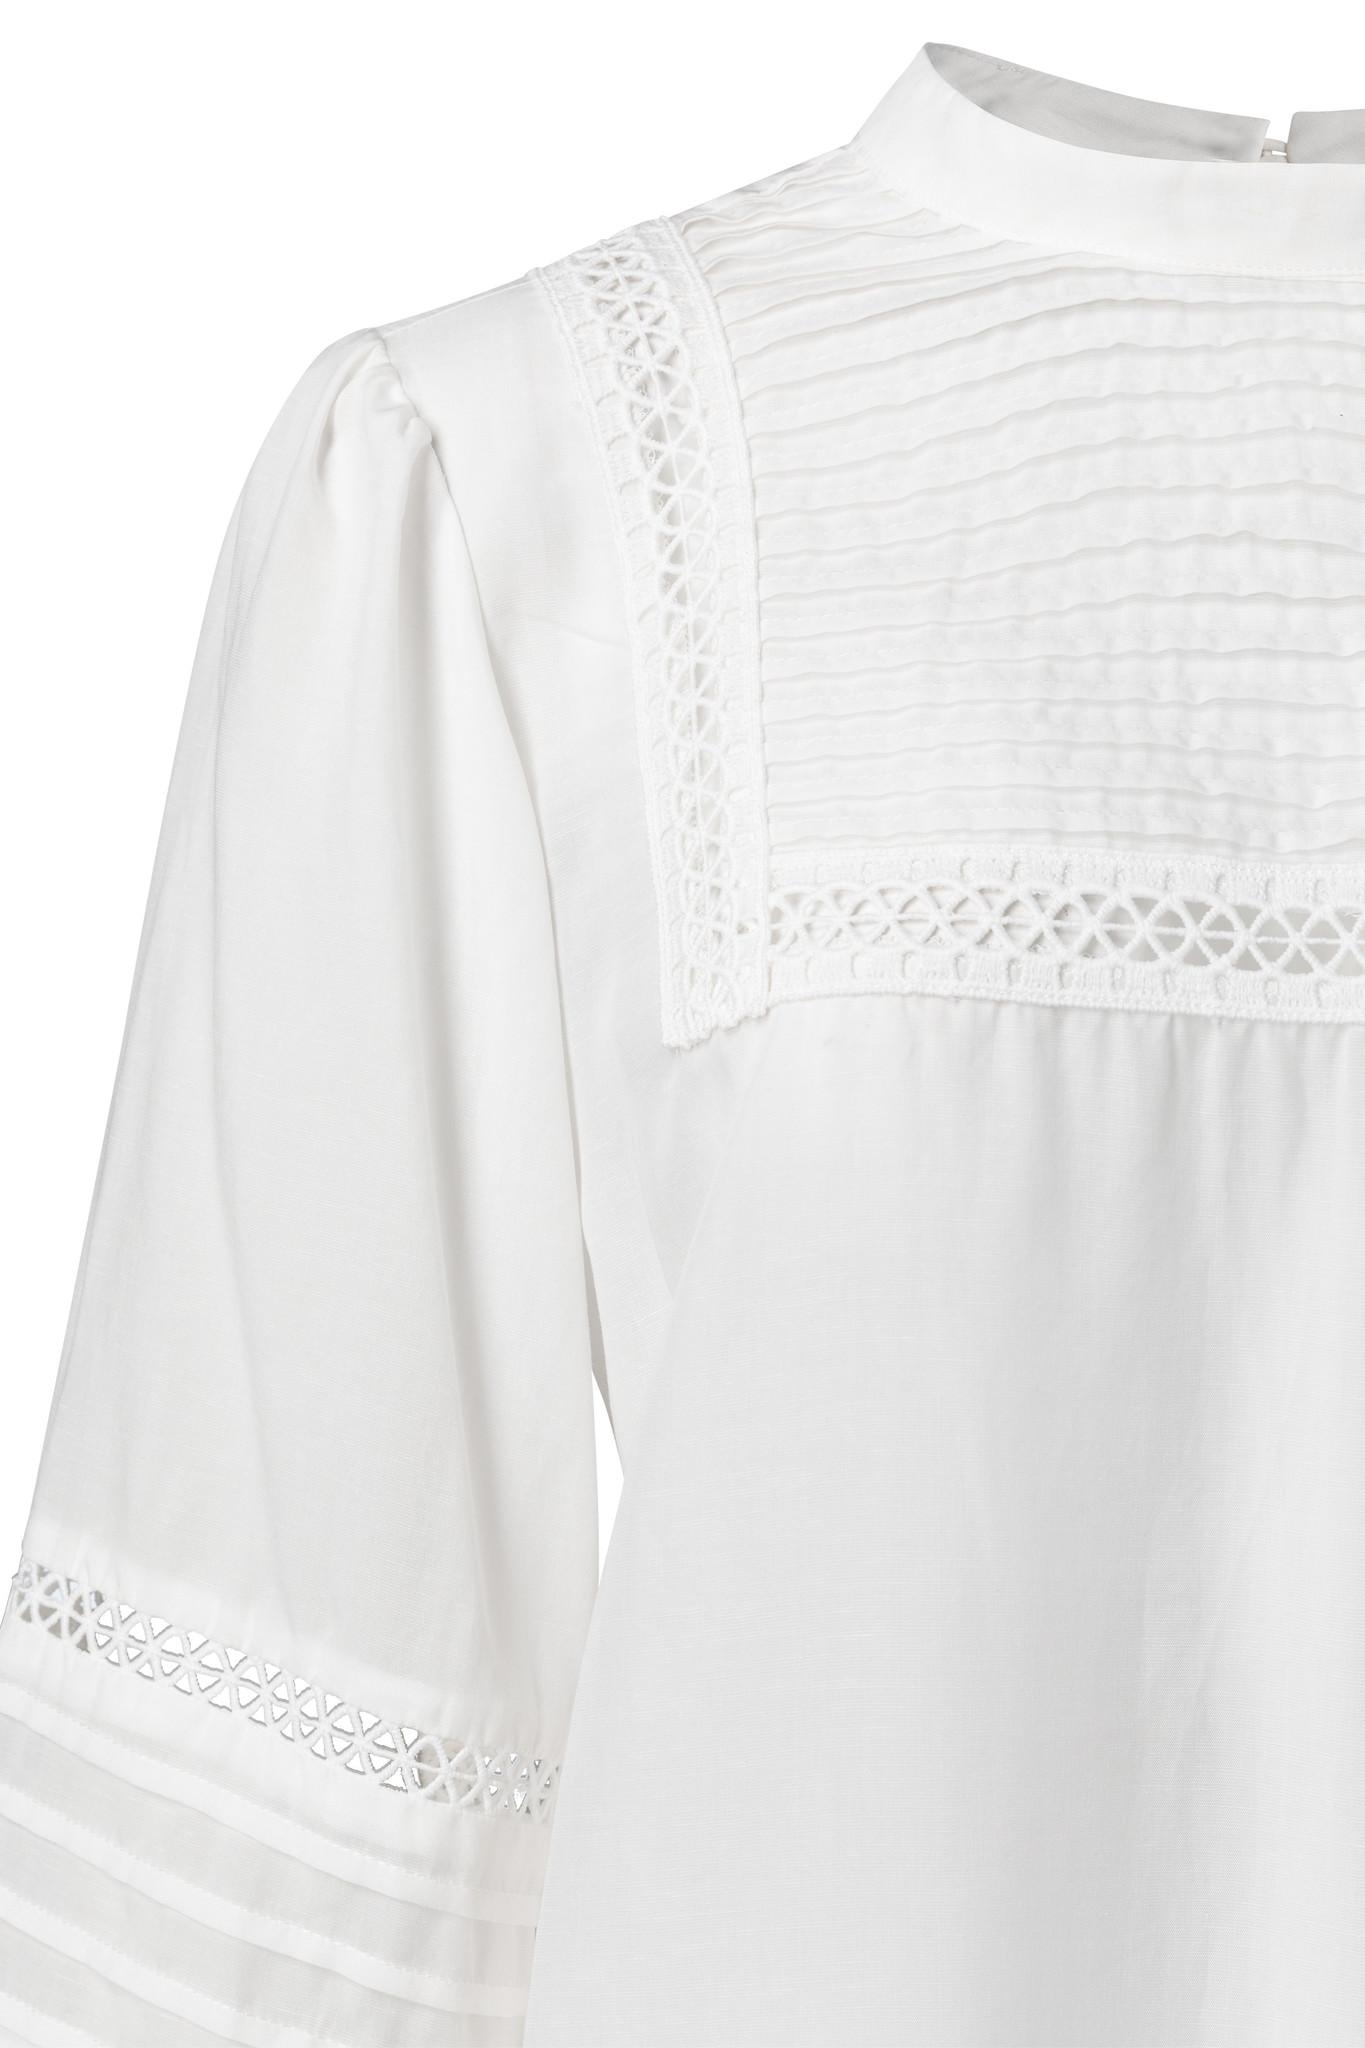 yaya Shirt with embroider 1101160-014-2